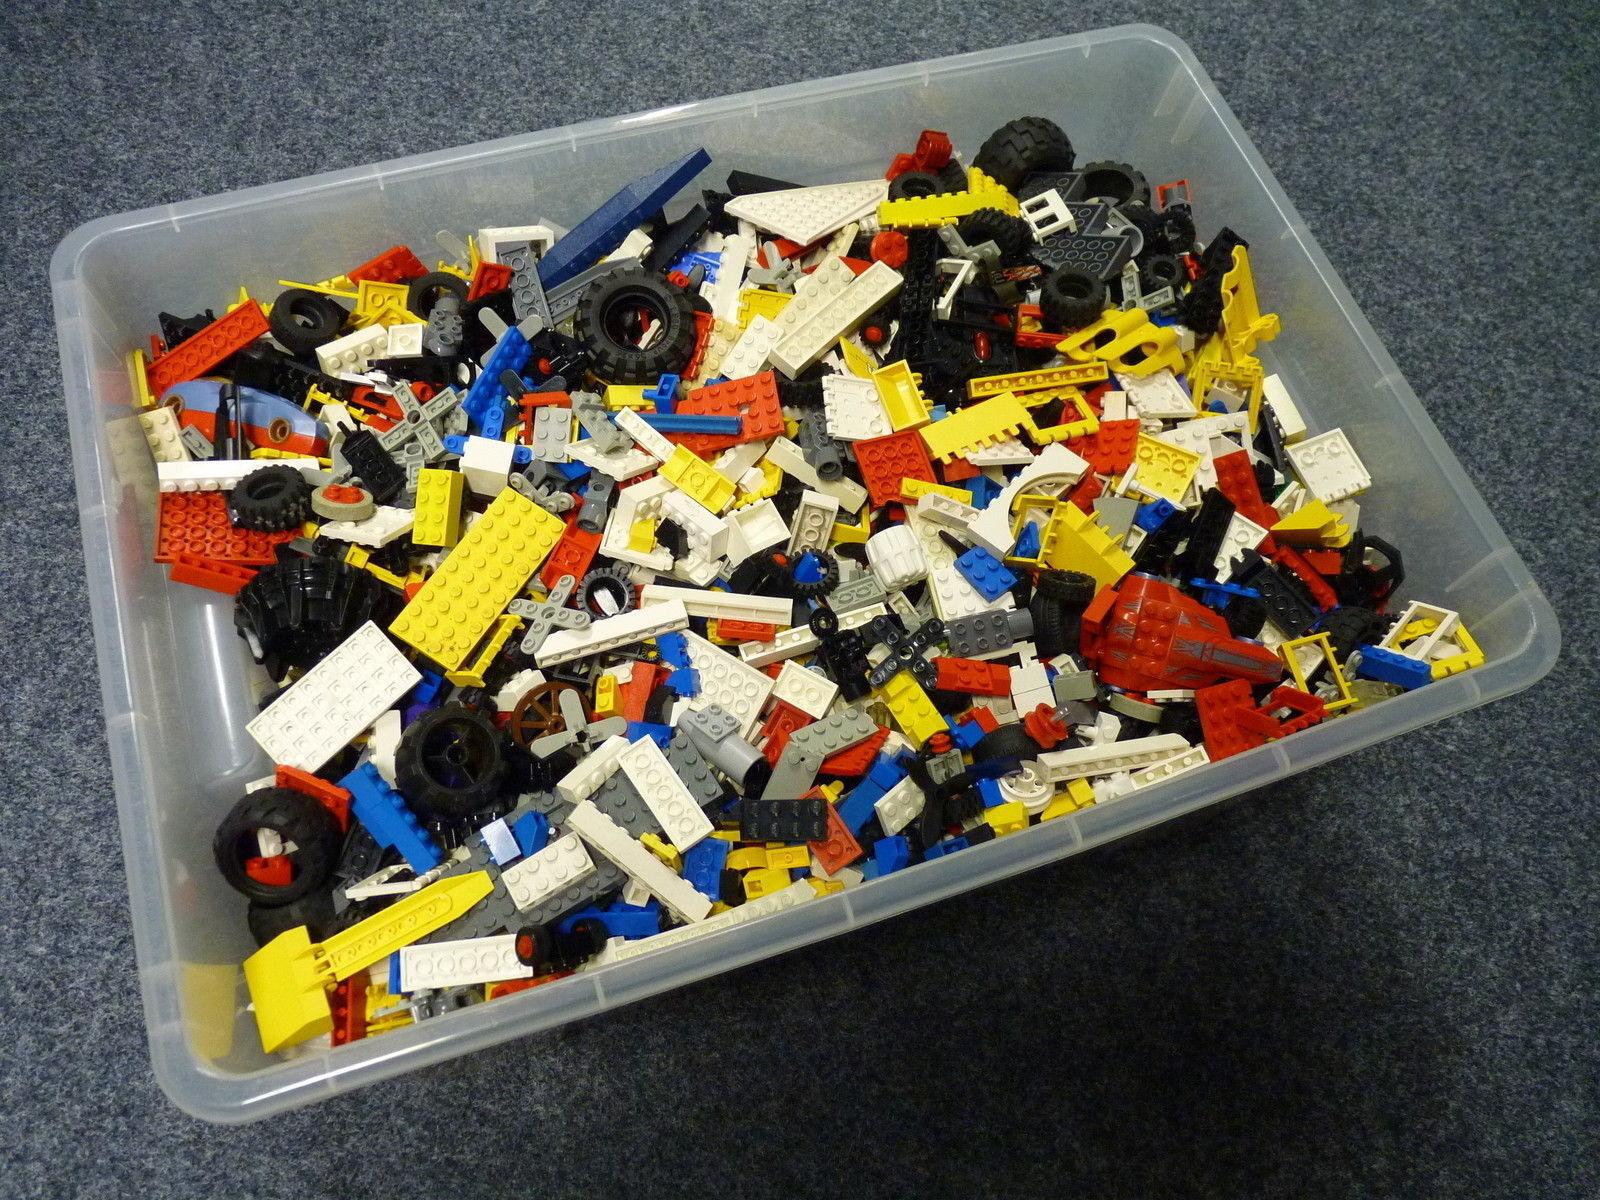 Lego Sammlung Konvolut Kiloware Kiloware Kiloware 2 Kg Kilo Steine